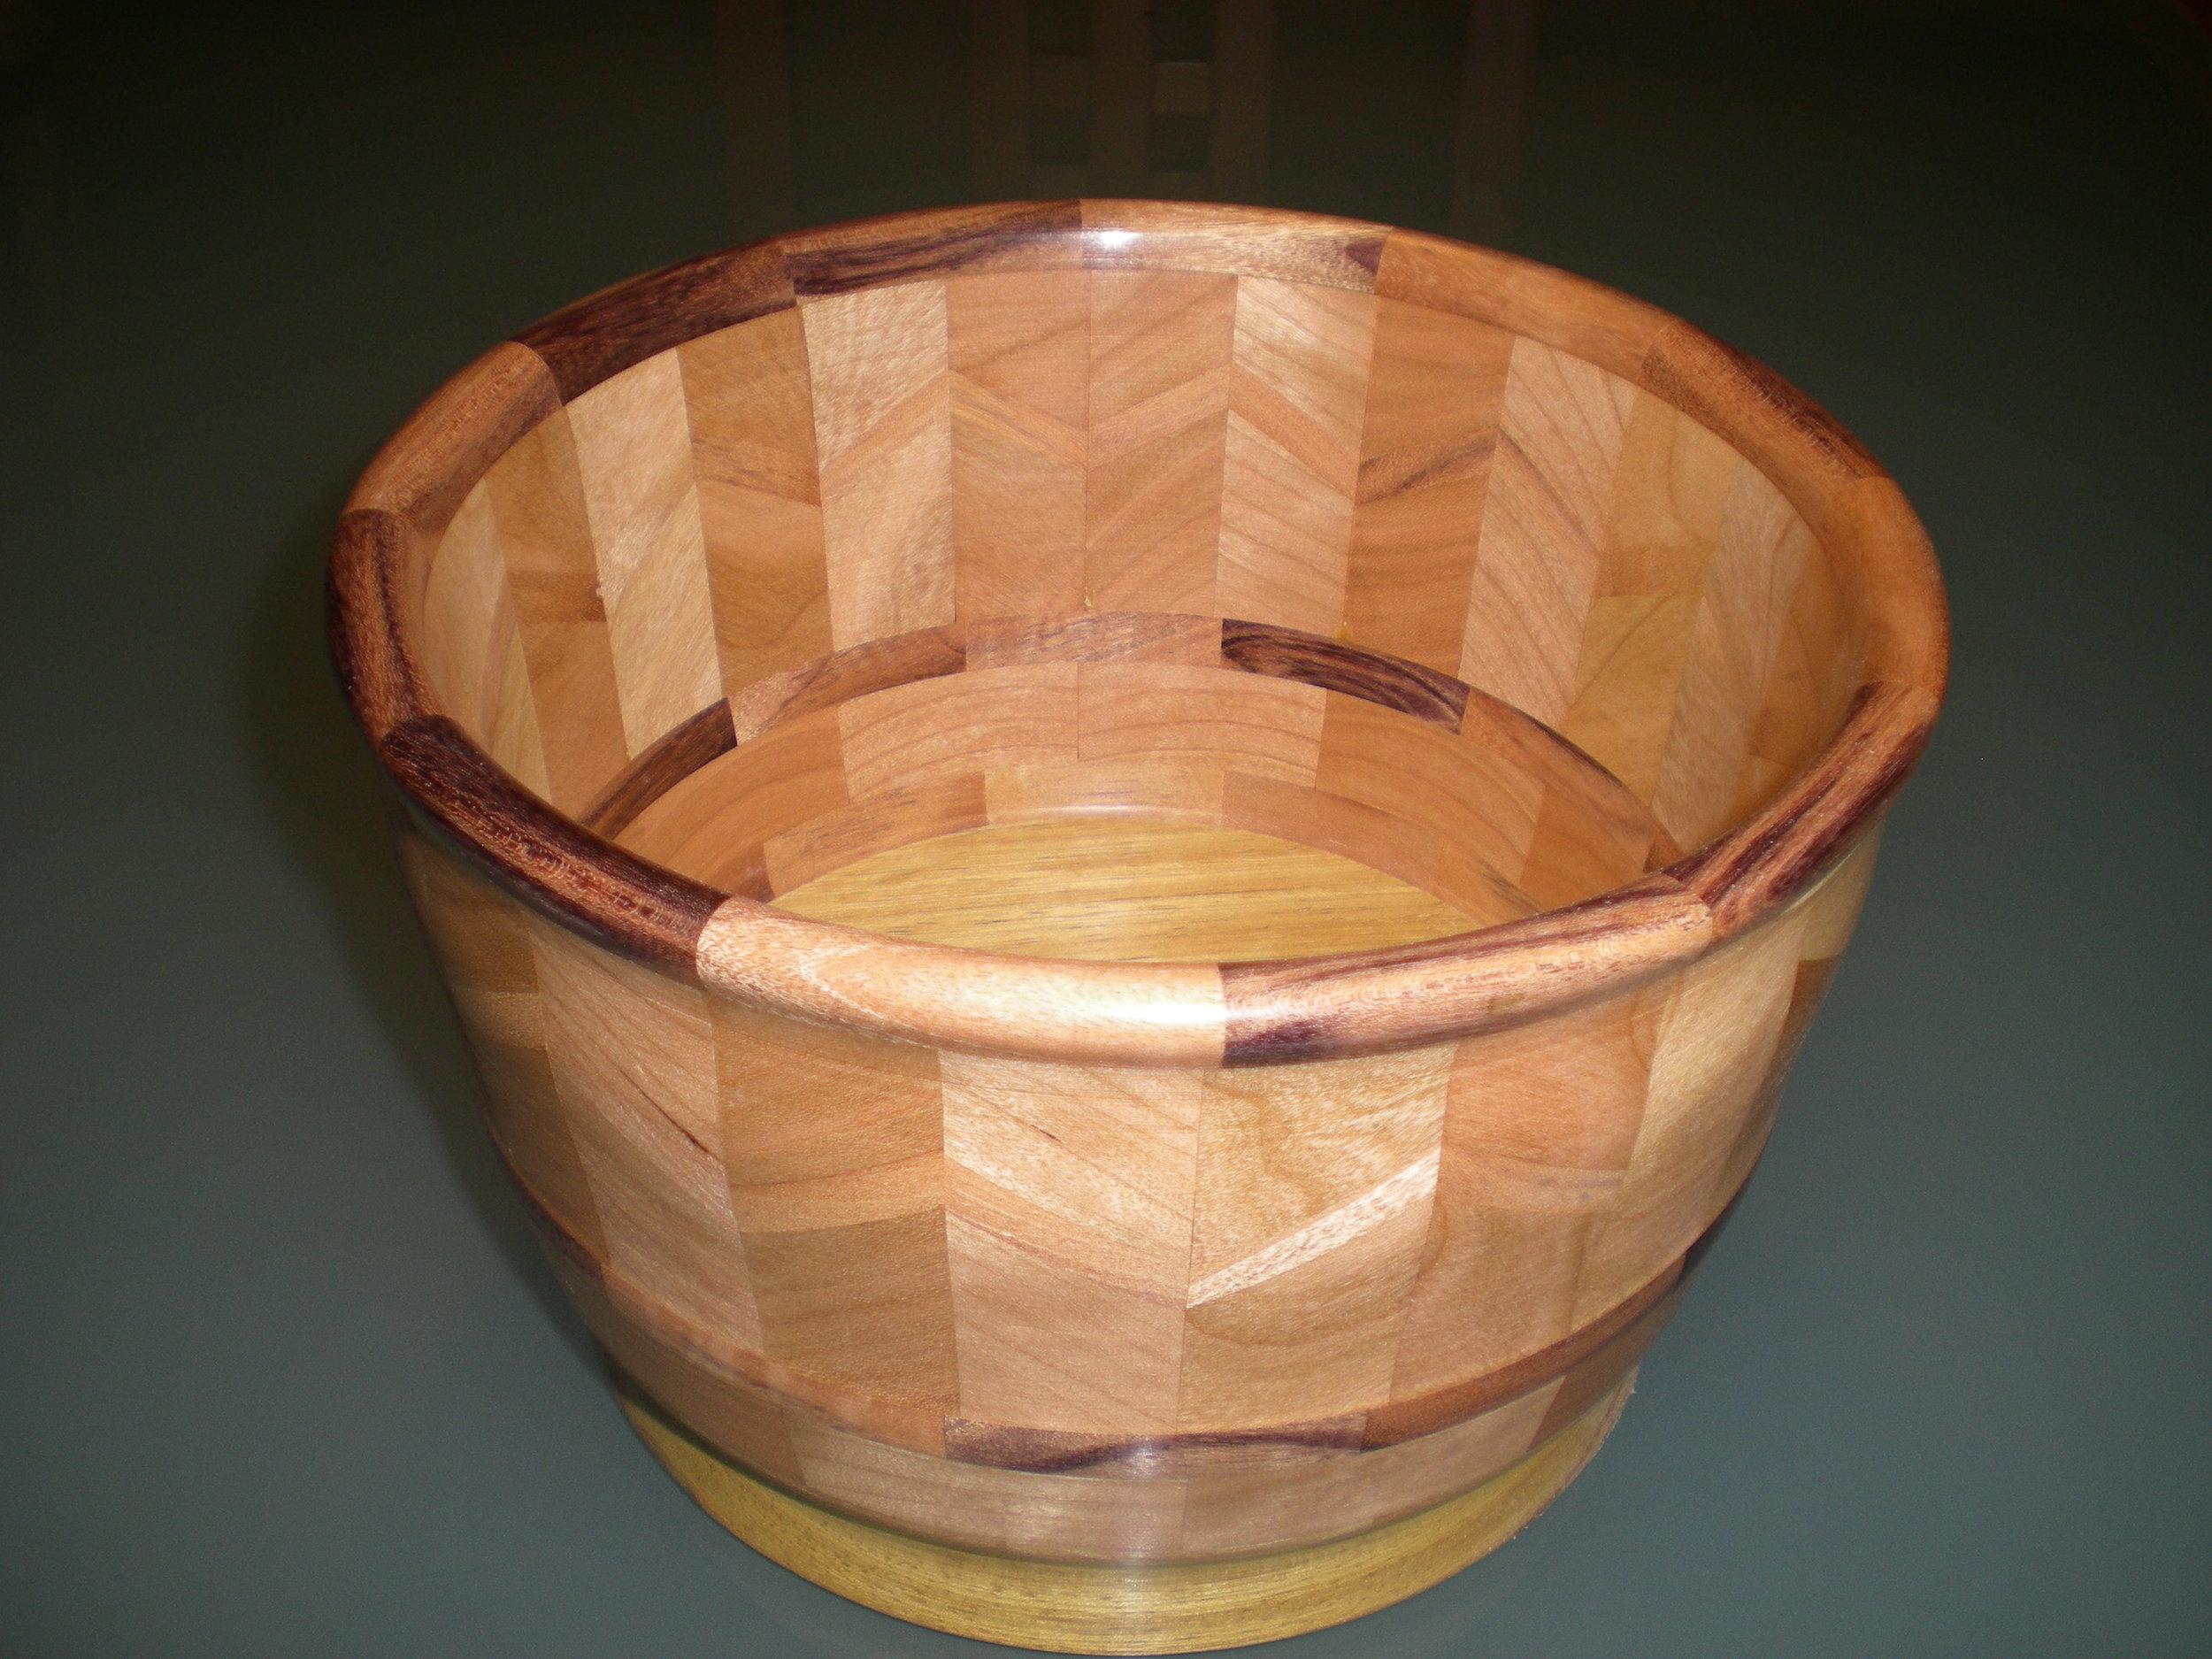 RJC Wood Creations - Bowls (46).JPG